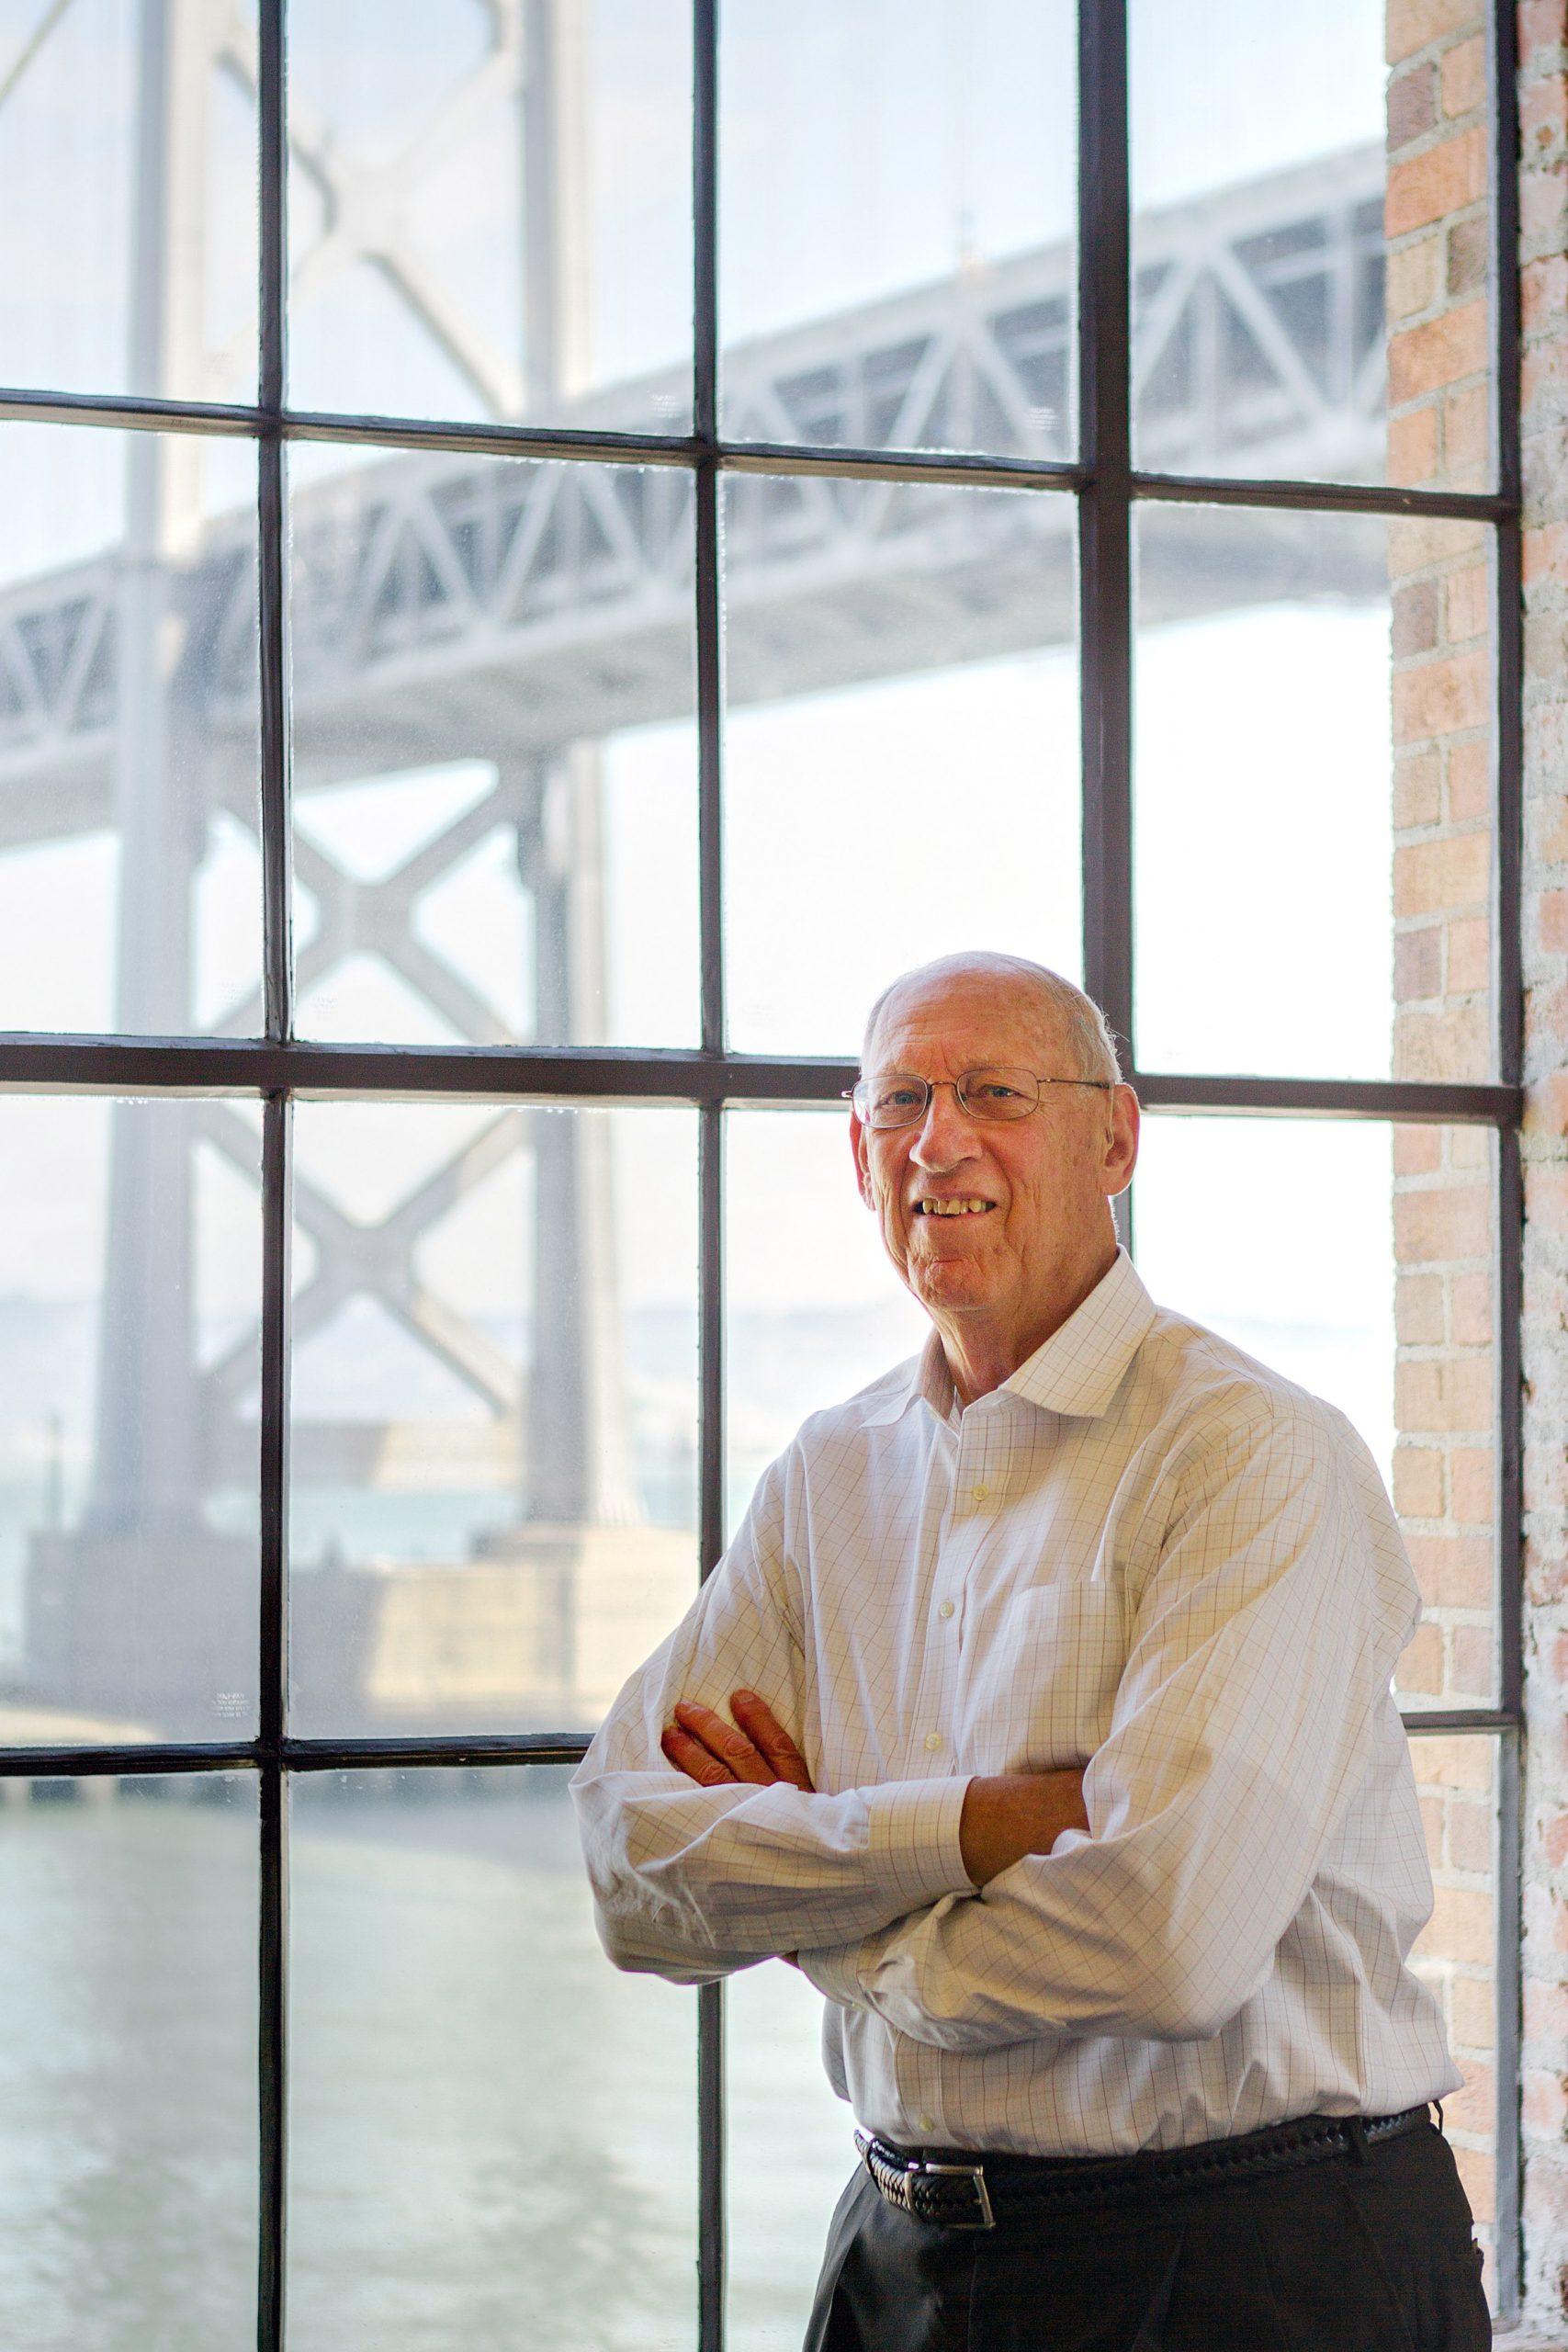 Architect and interior designer Art Gensler